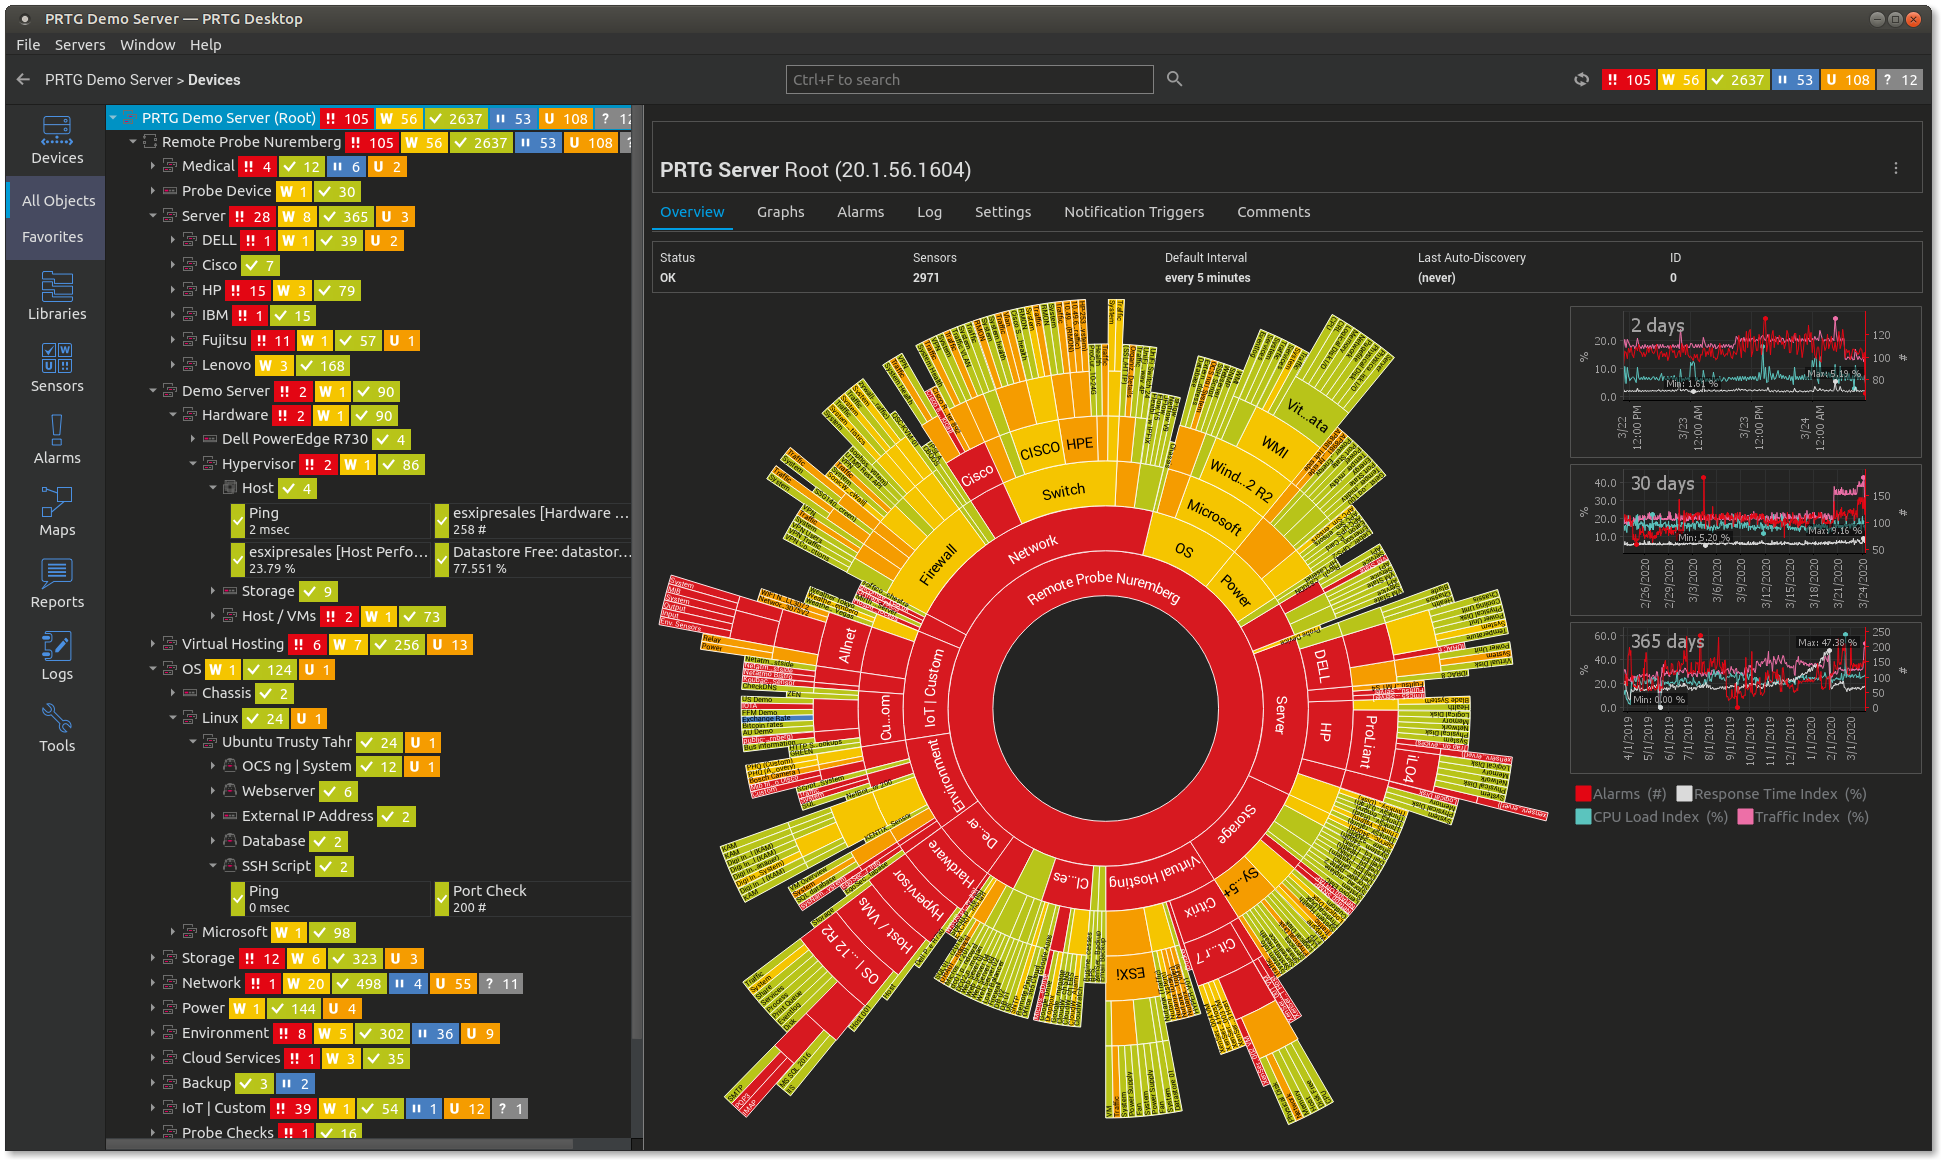 prtg-desktop-for-linux-beta-screenshot-sunburst